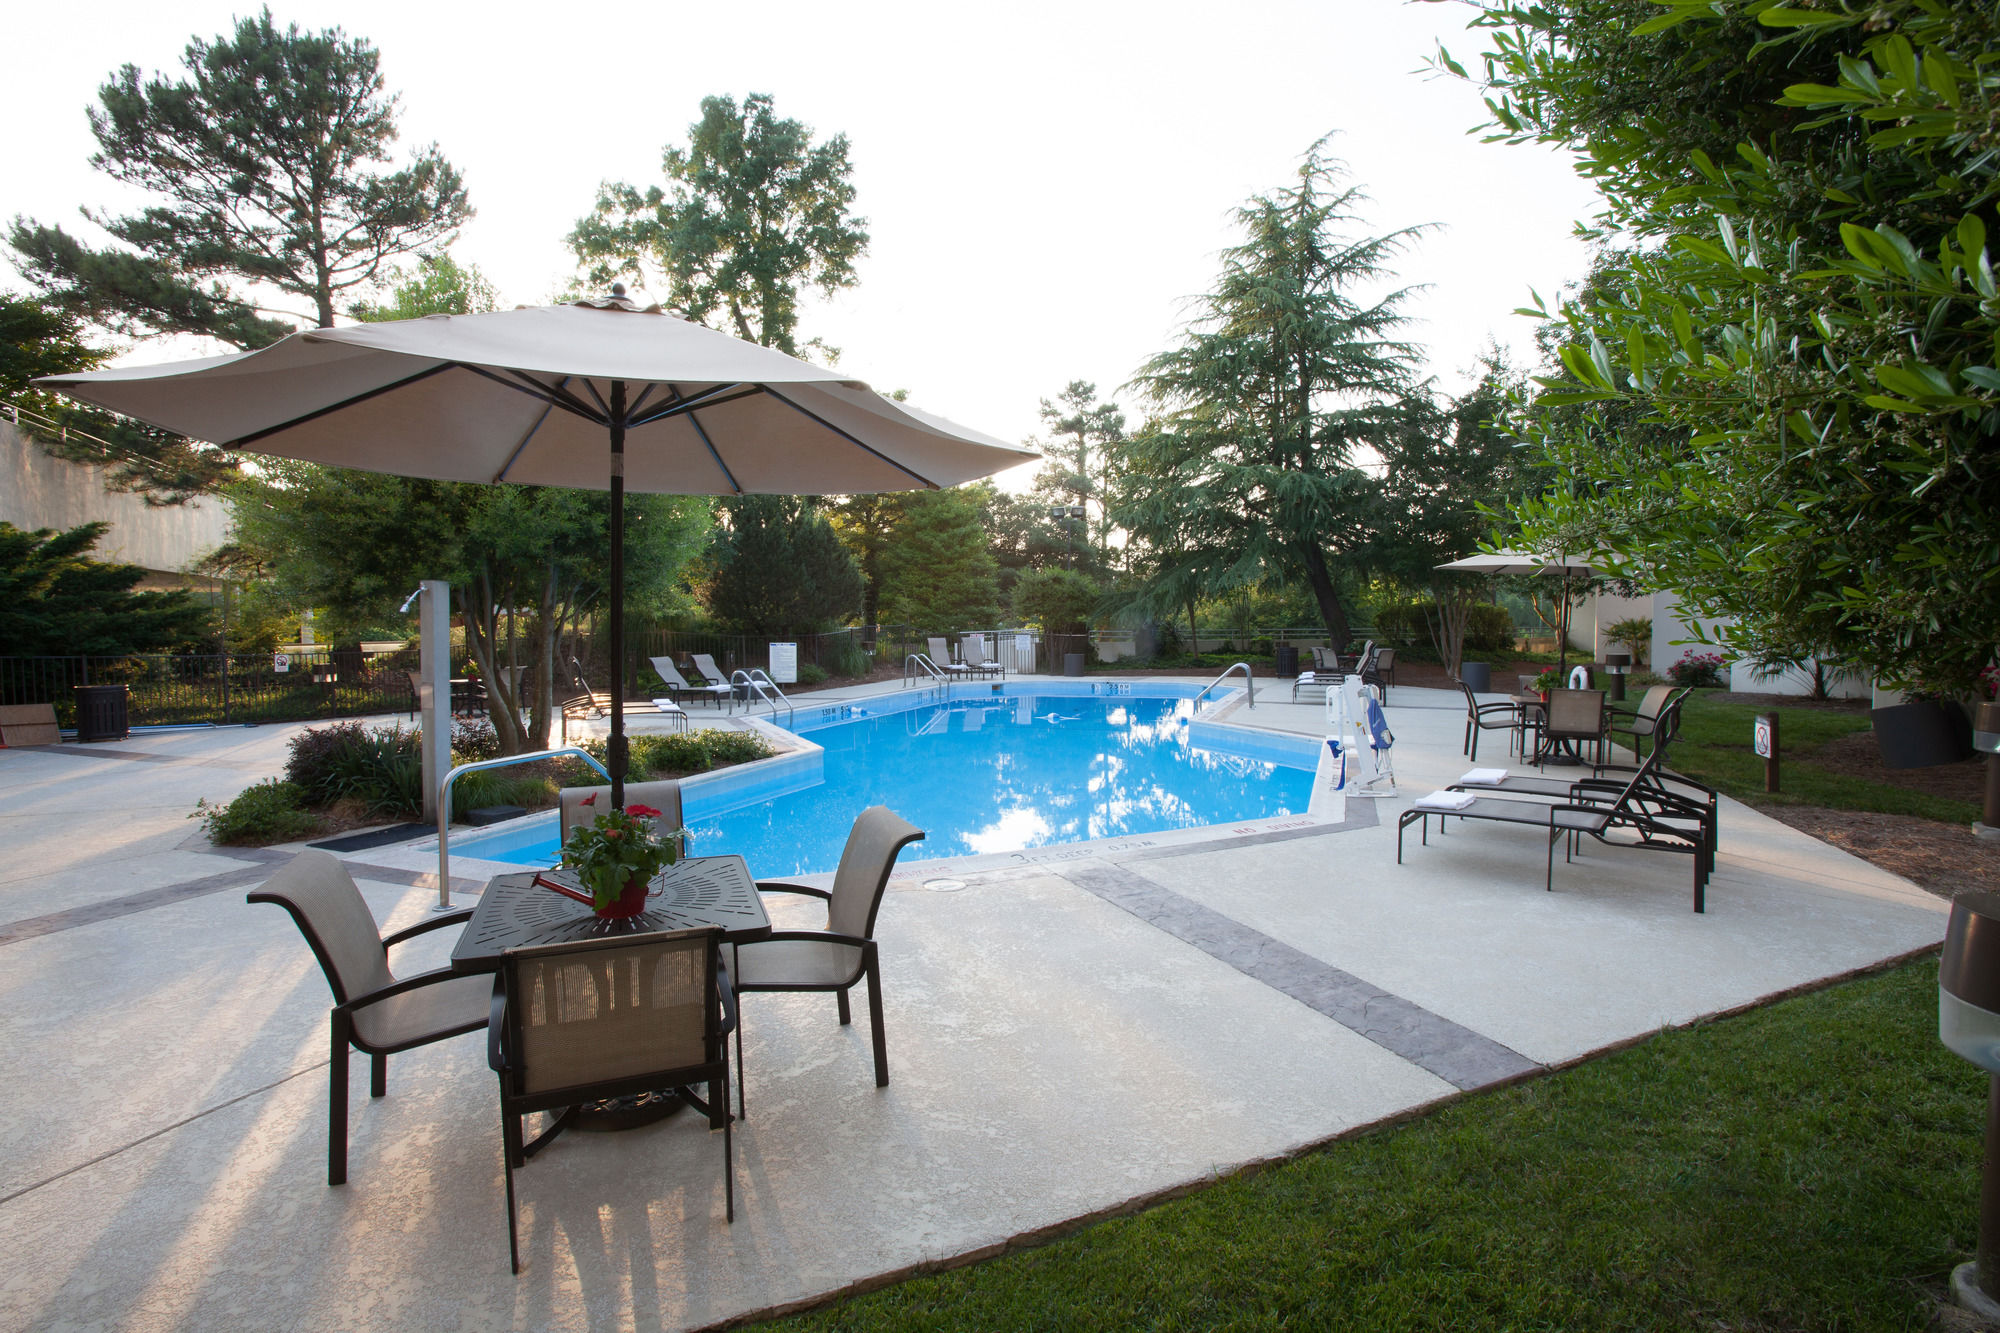 Sheraton Chapel Hill Hotel in Chapel Hill, NC